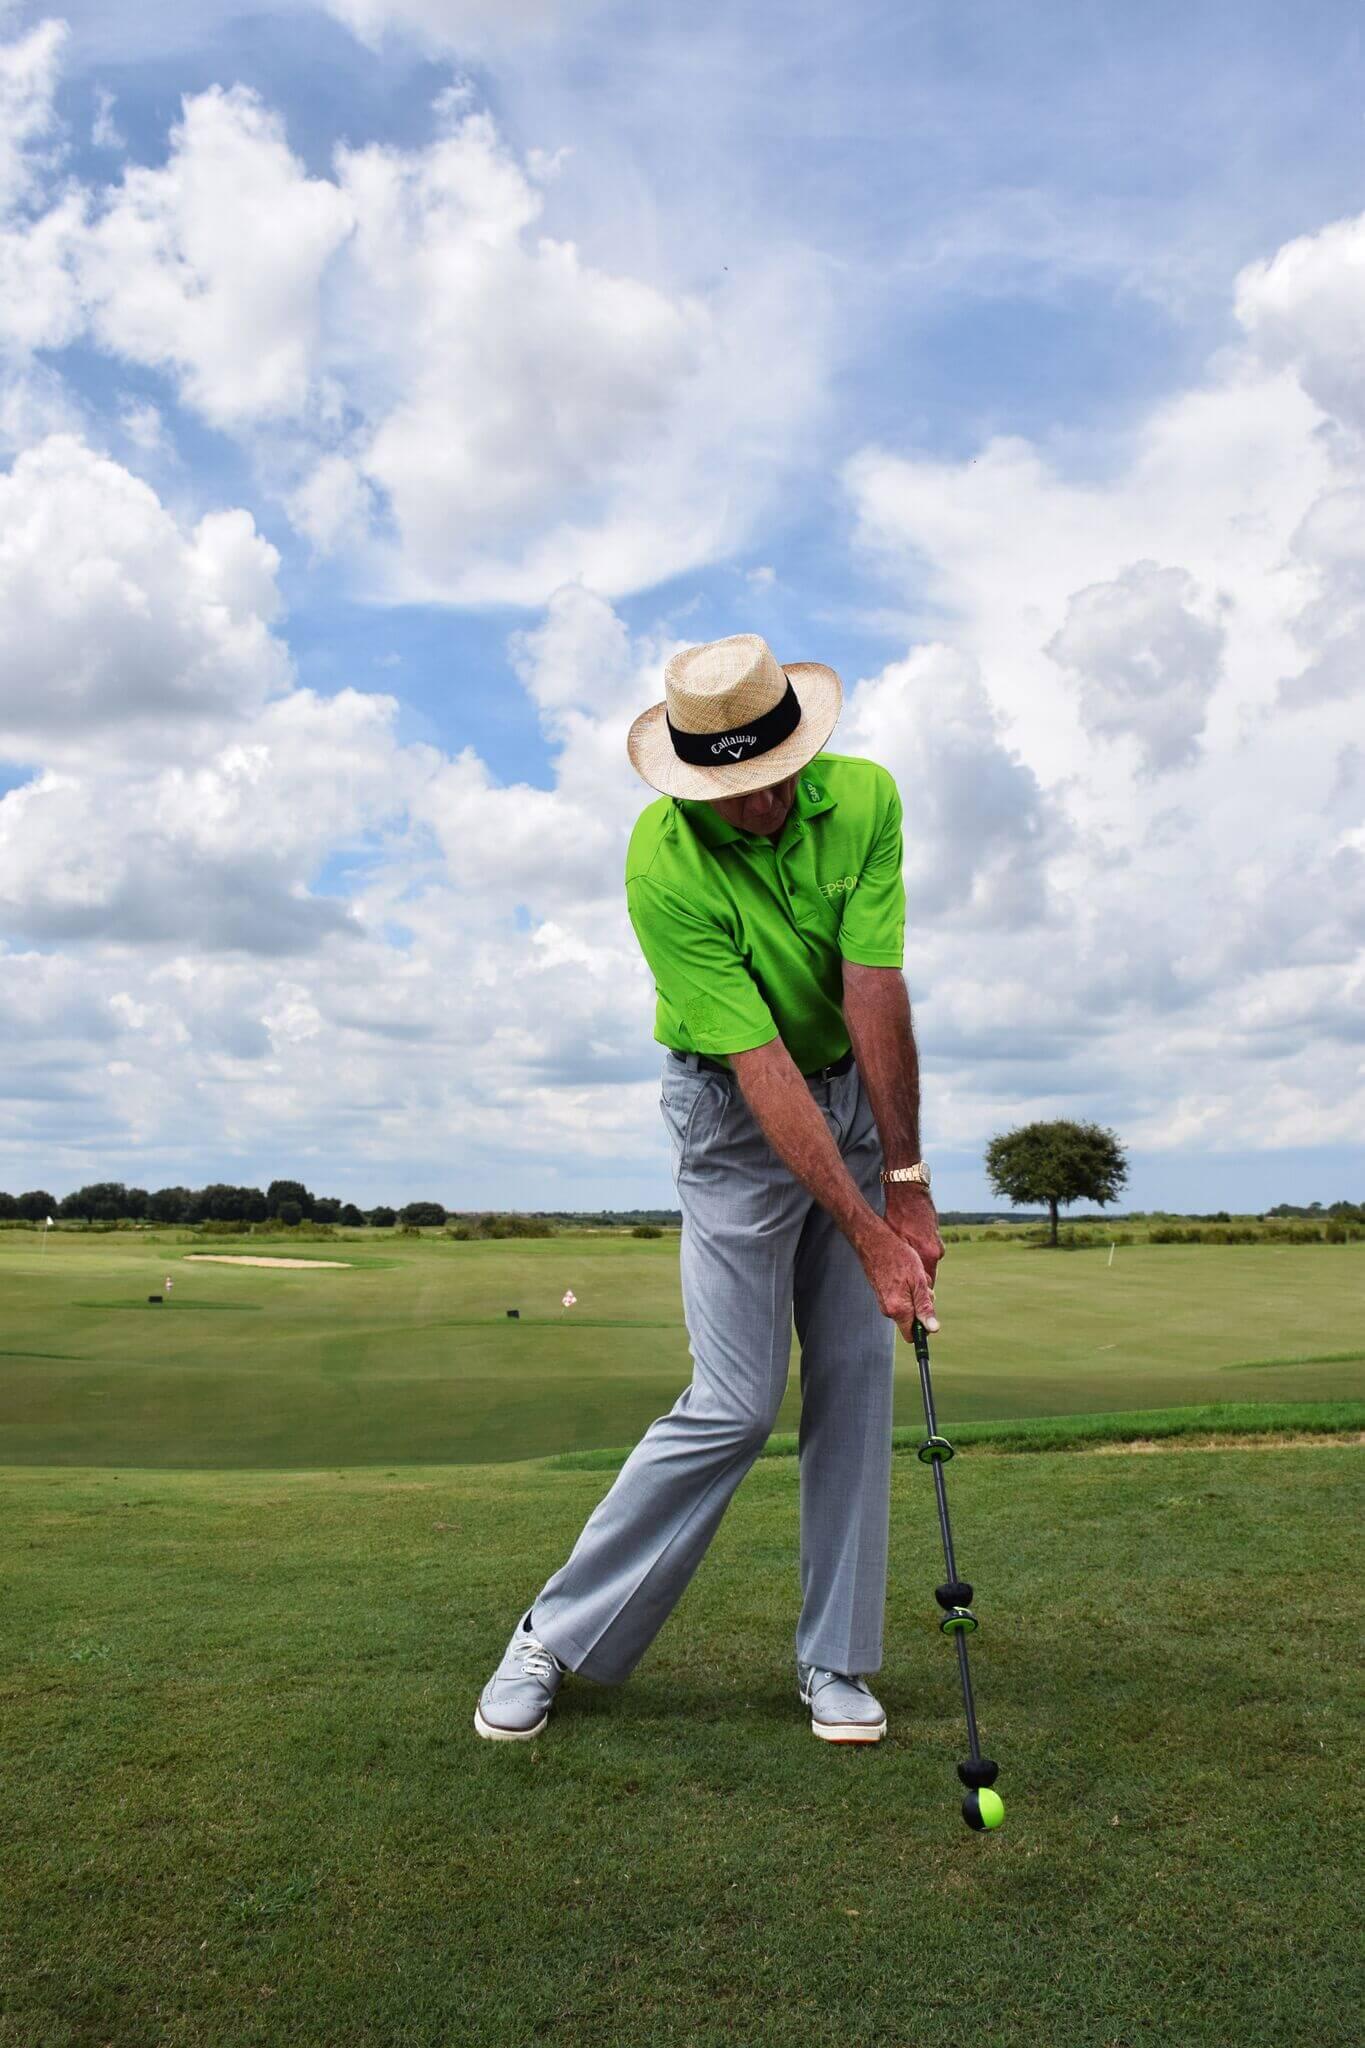 dp sports golf outdoors swing training correcting com aids tool amazon